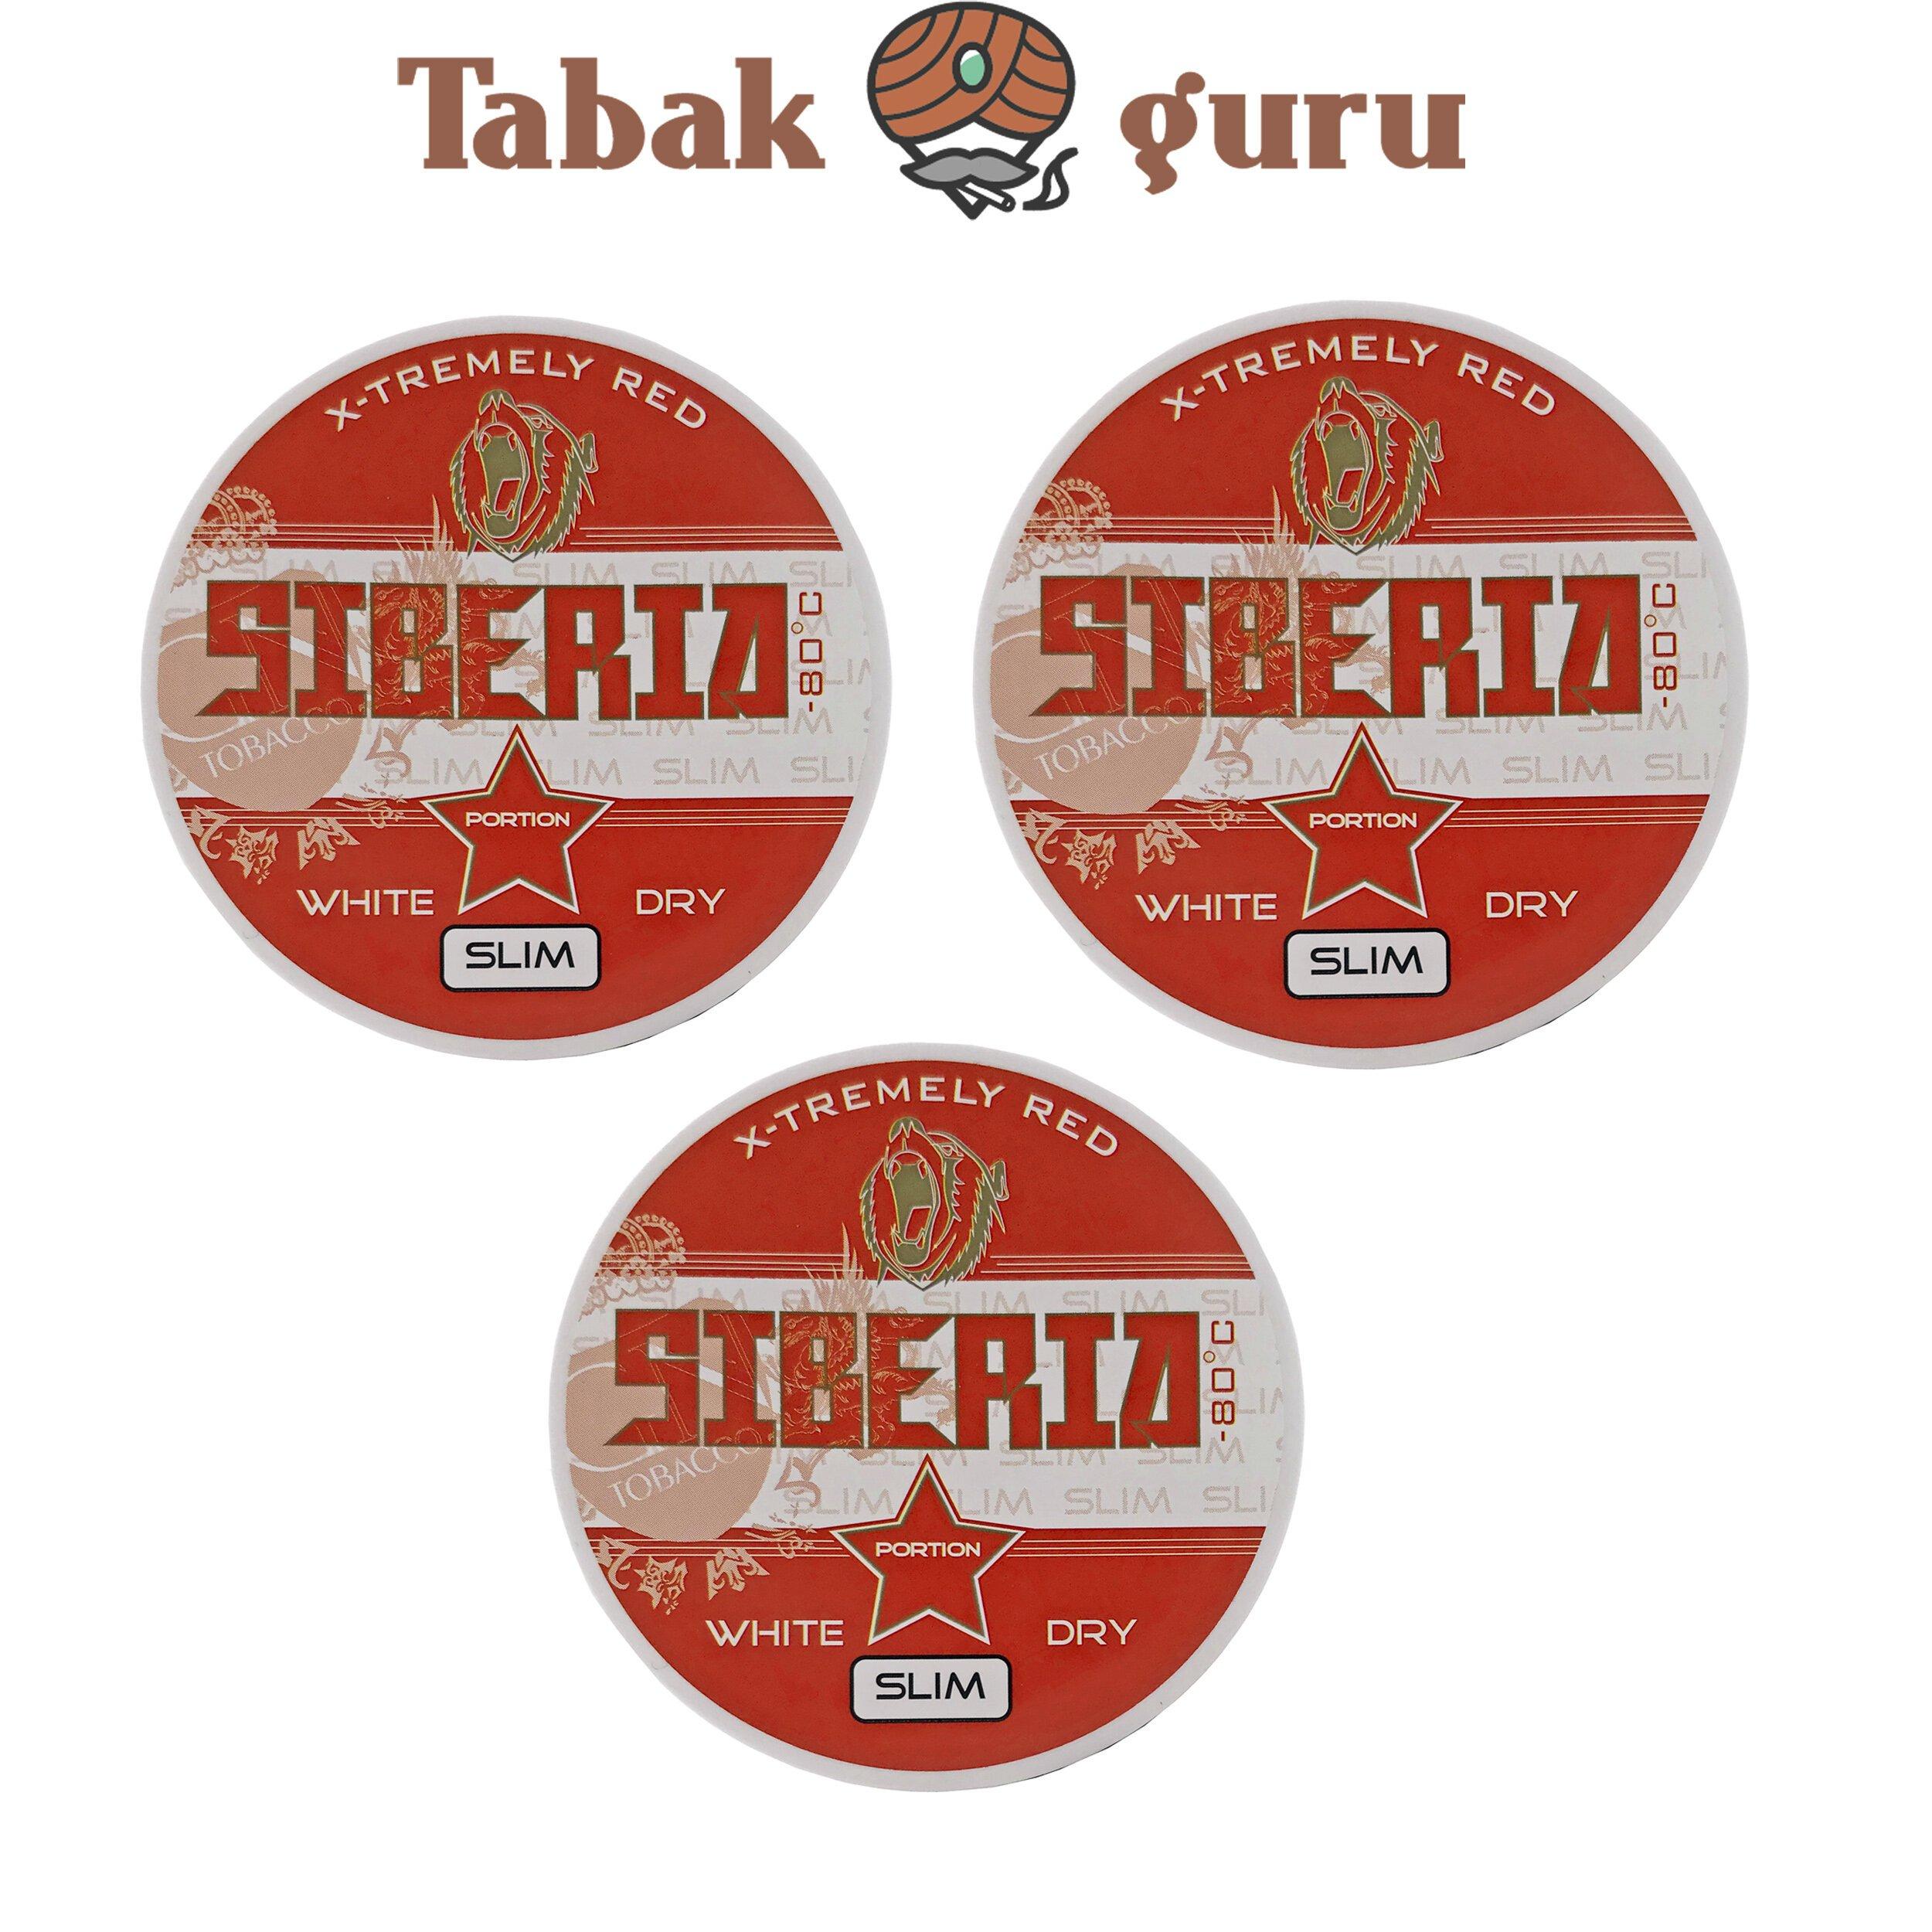 3x Siberia 80° Extremely Red White Dry Slim Kautabak Dose